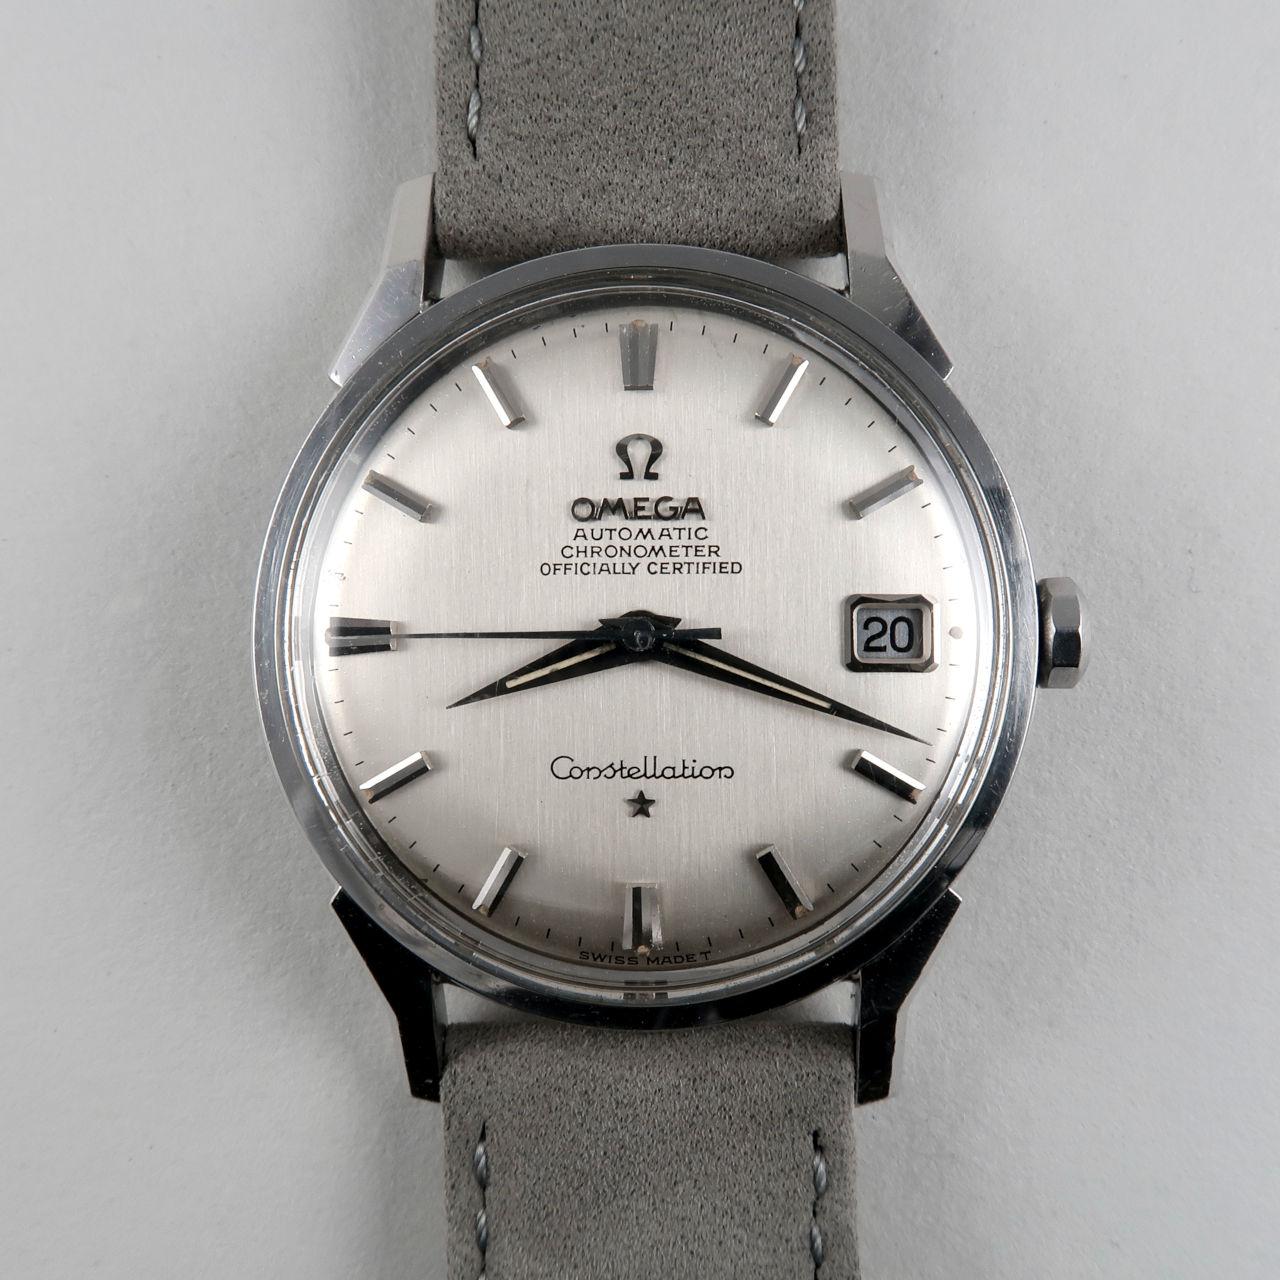 Omega Constellation Ref. 168.005 circa 1967 steel